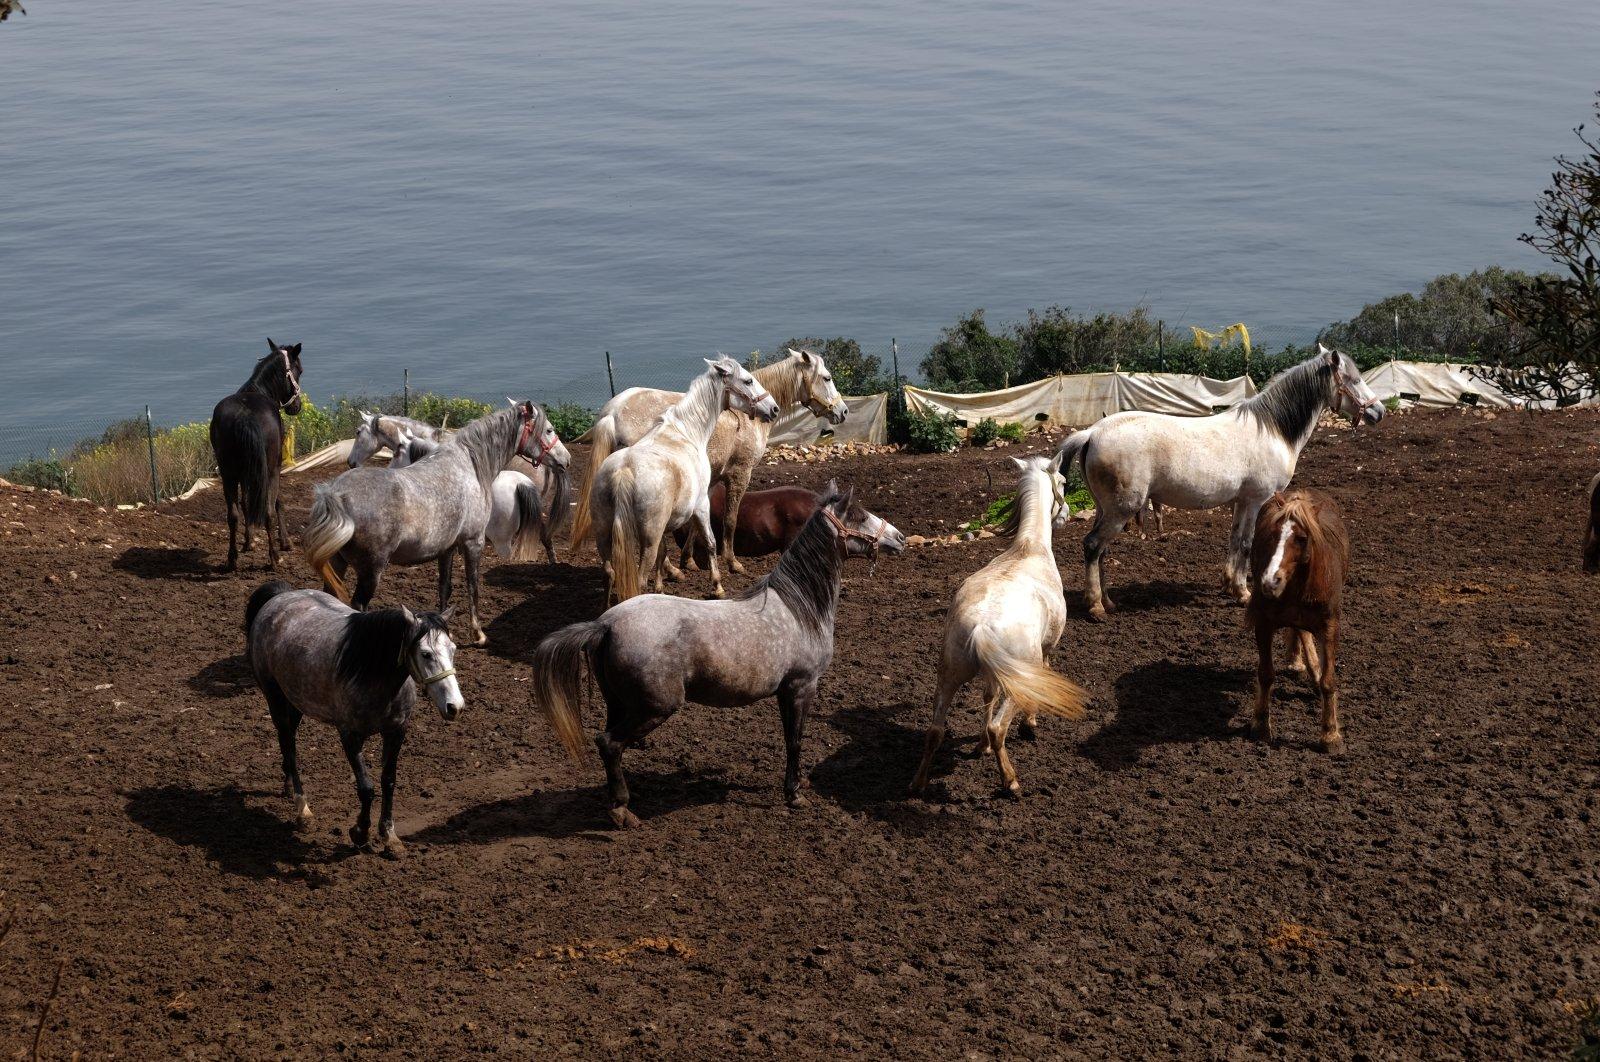 Horses at an Istanbul Metropolitan Municipality (IBB) farm in Büyükada, one of the Princes' Islands, Turkey, on Dec. 18, 2020. (AA Photo)